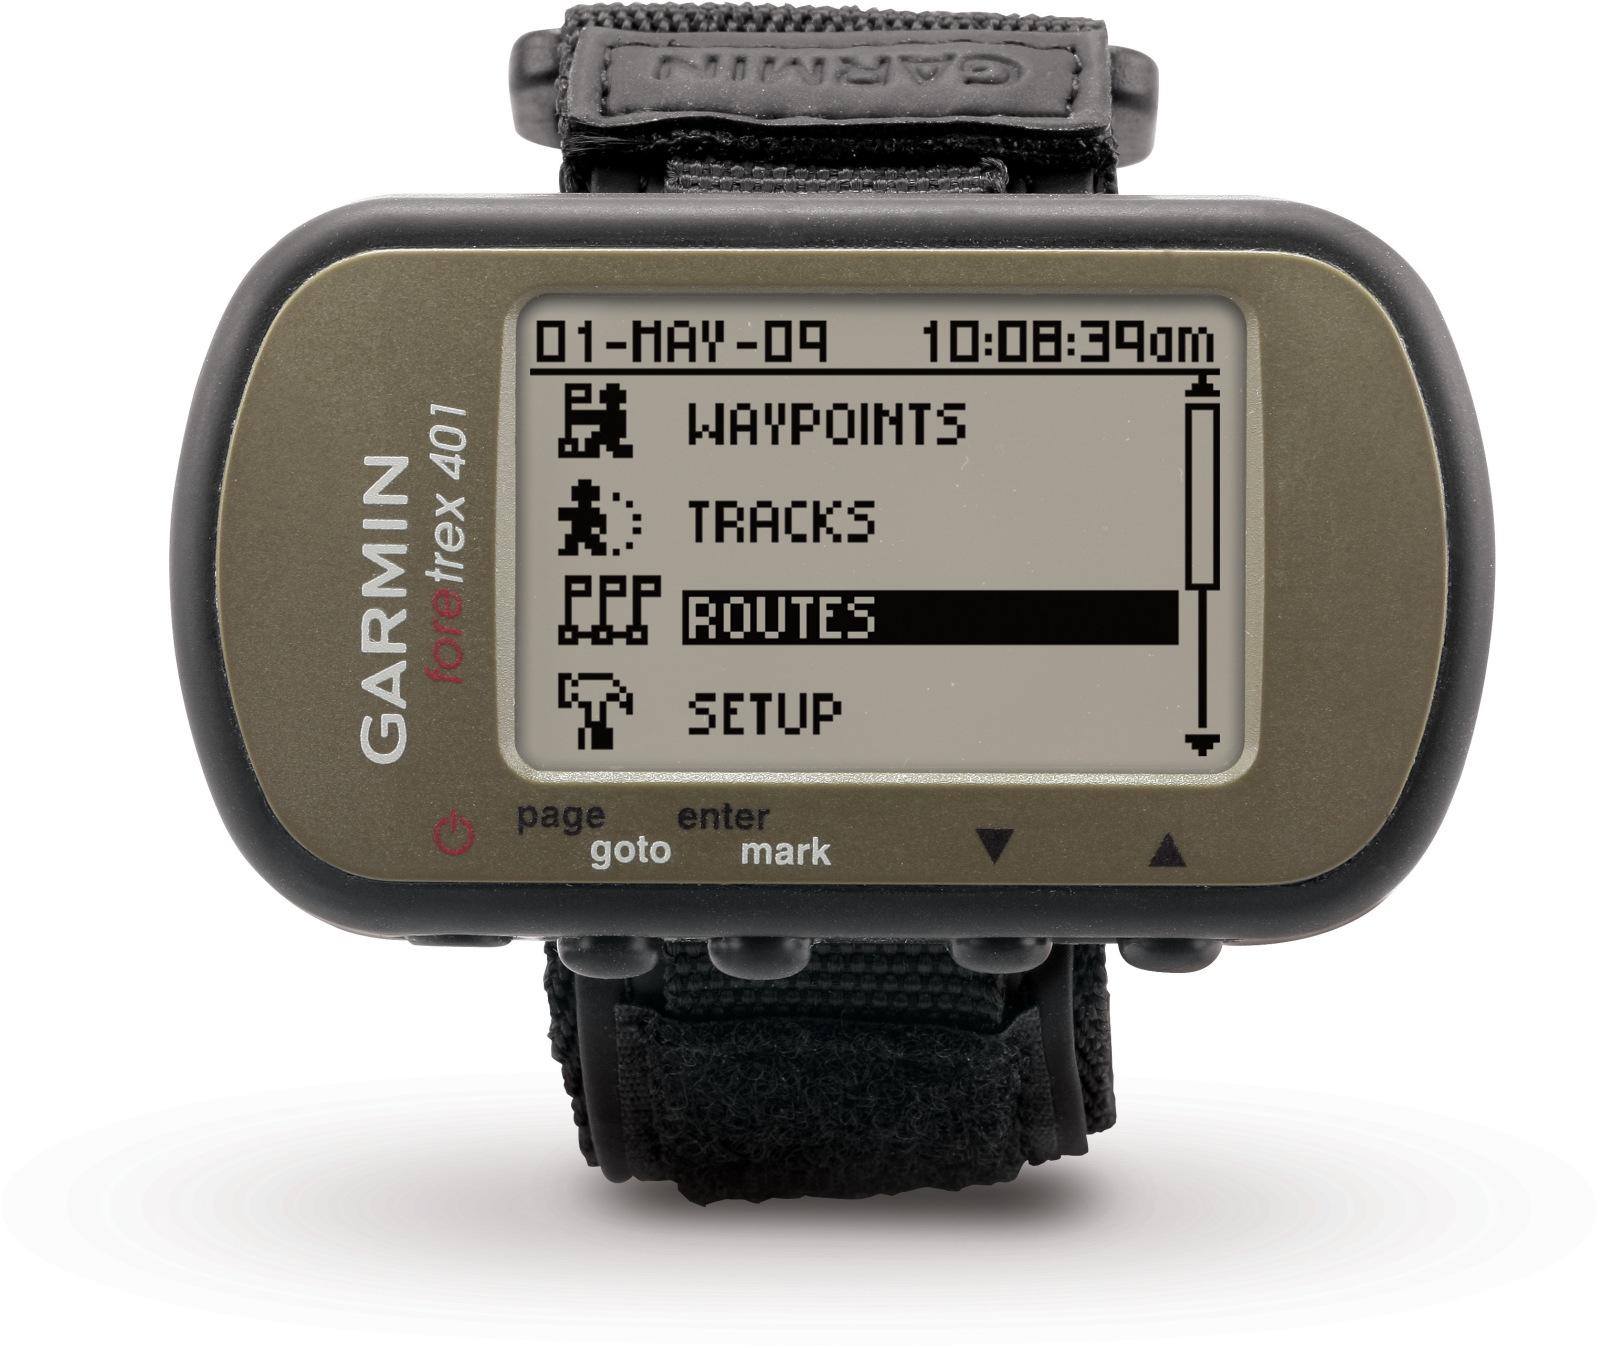 Garmin Foretrex 401 GPS Navigator Watch